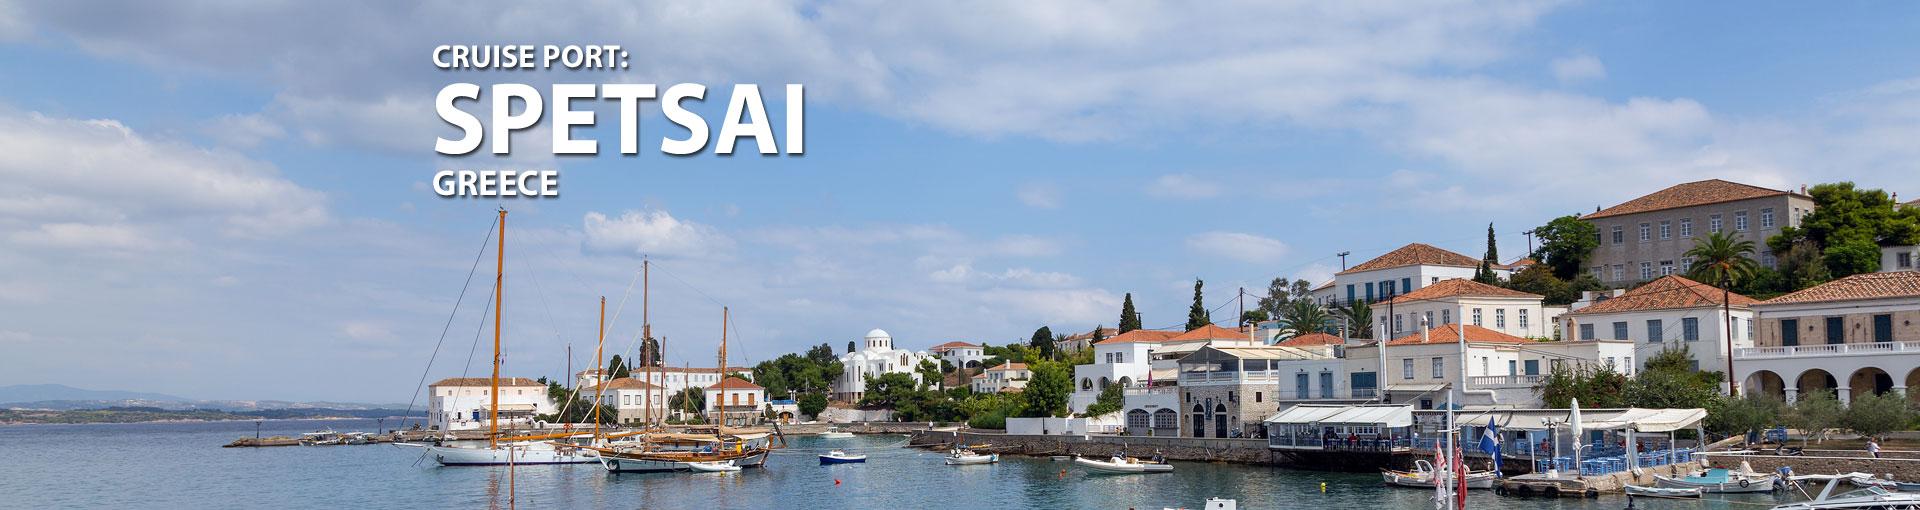 Cruises to Spetsai, Greece